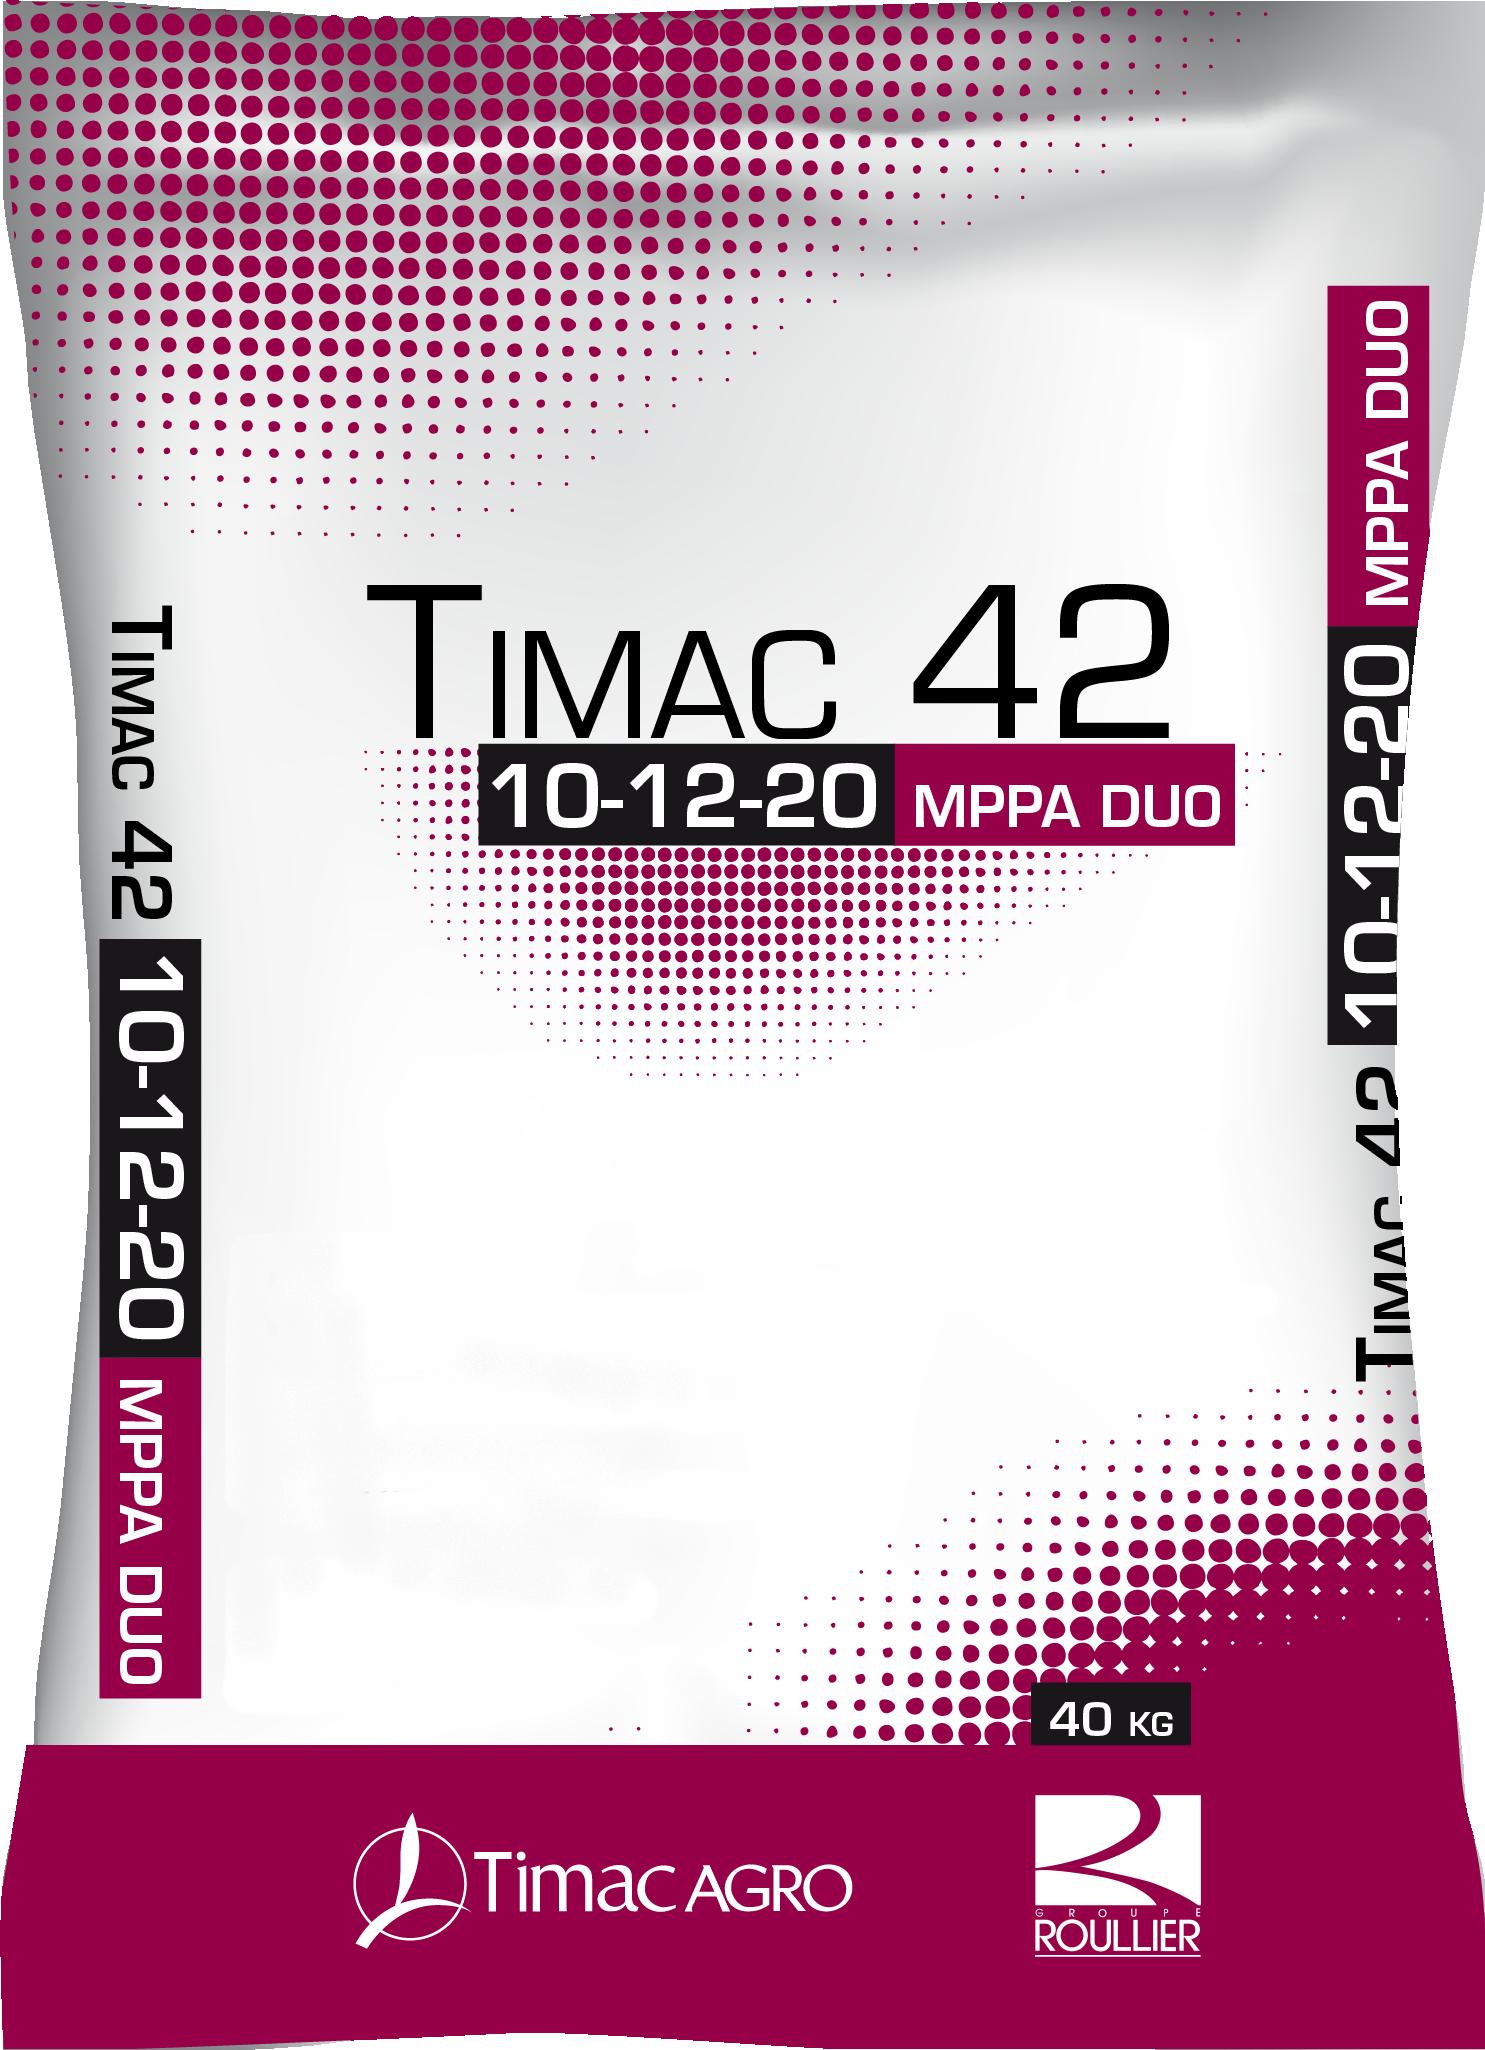 Timac 42